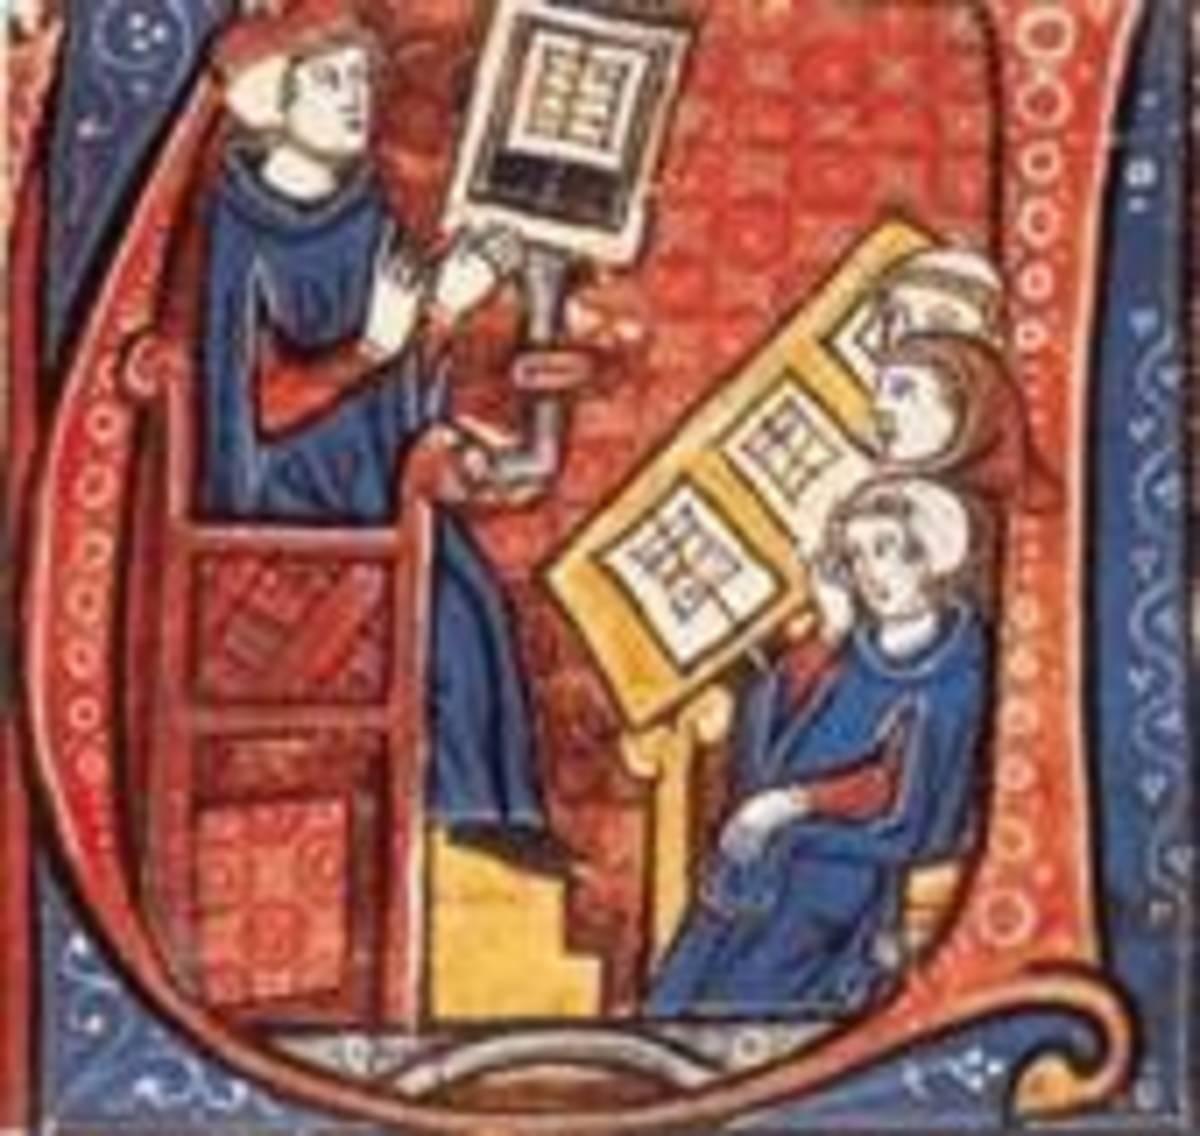 13th-century illuminated manuscript showing students at university